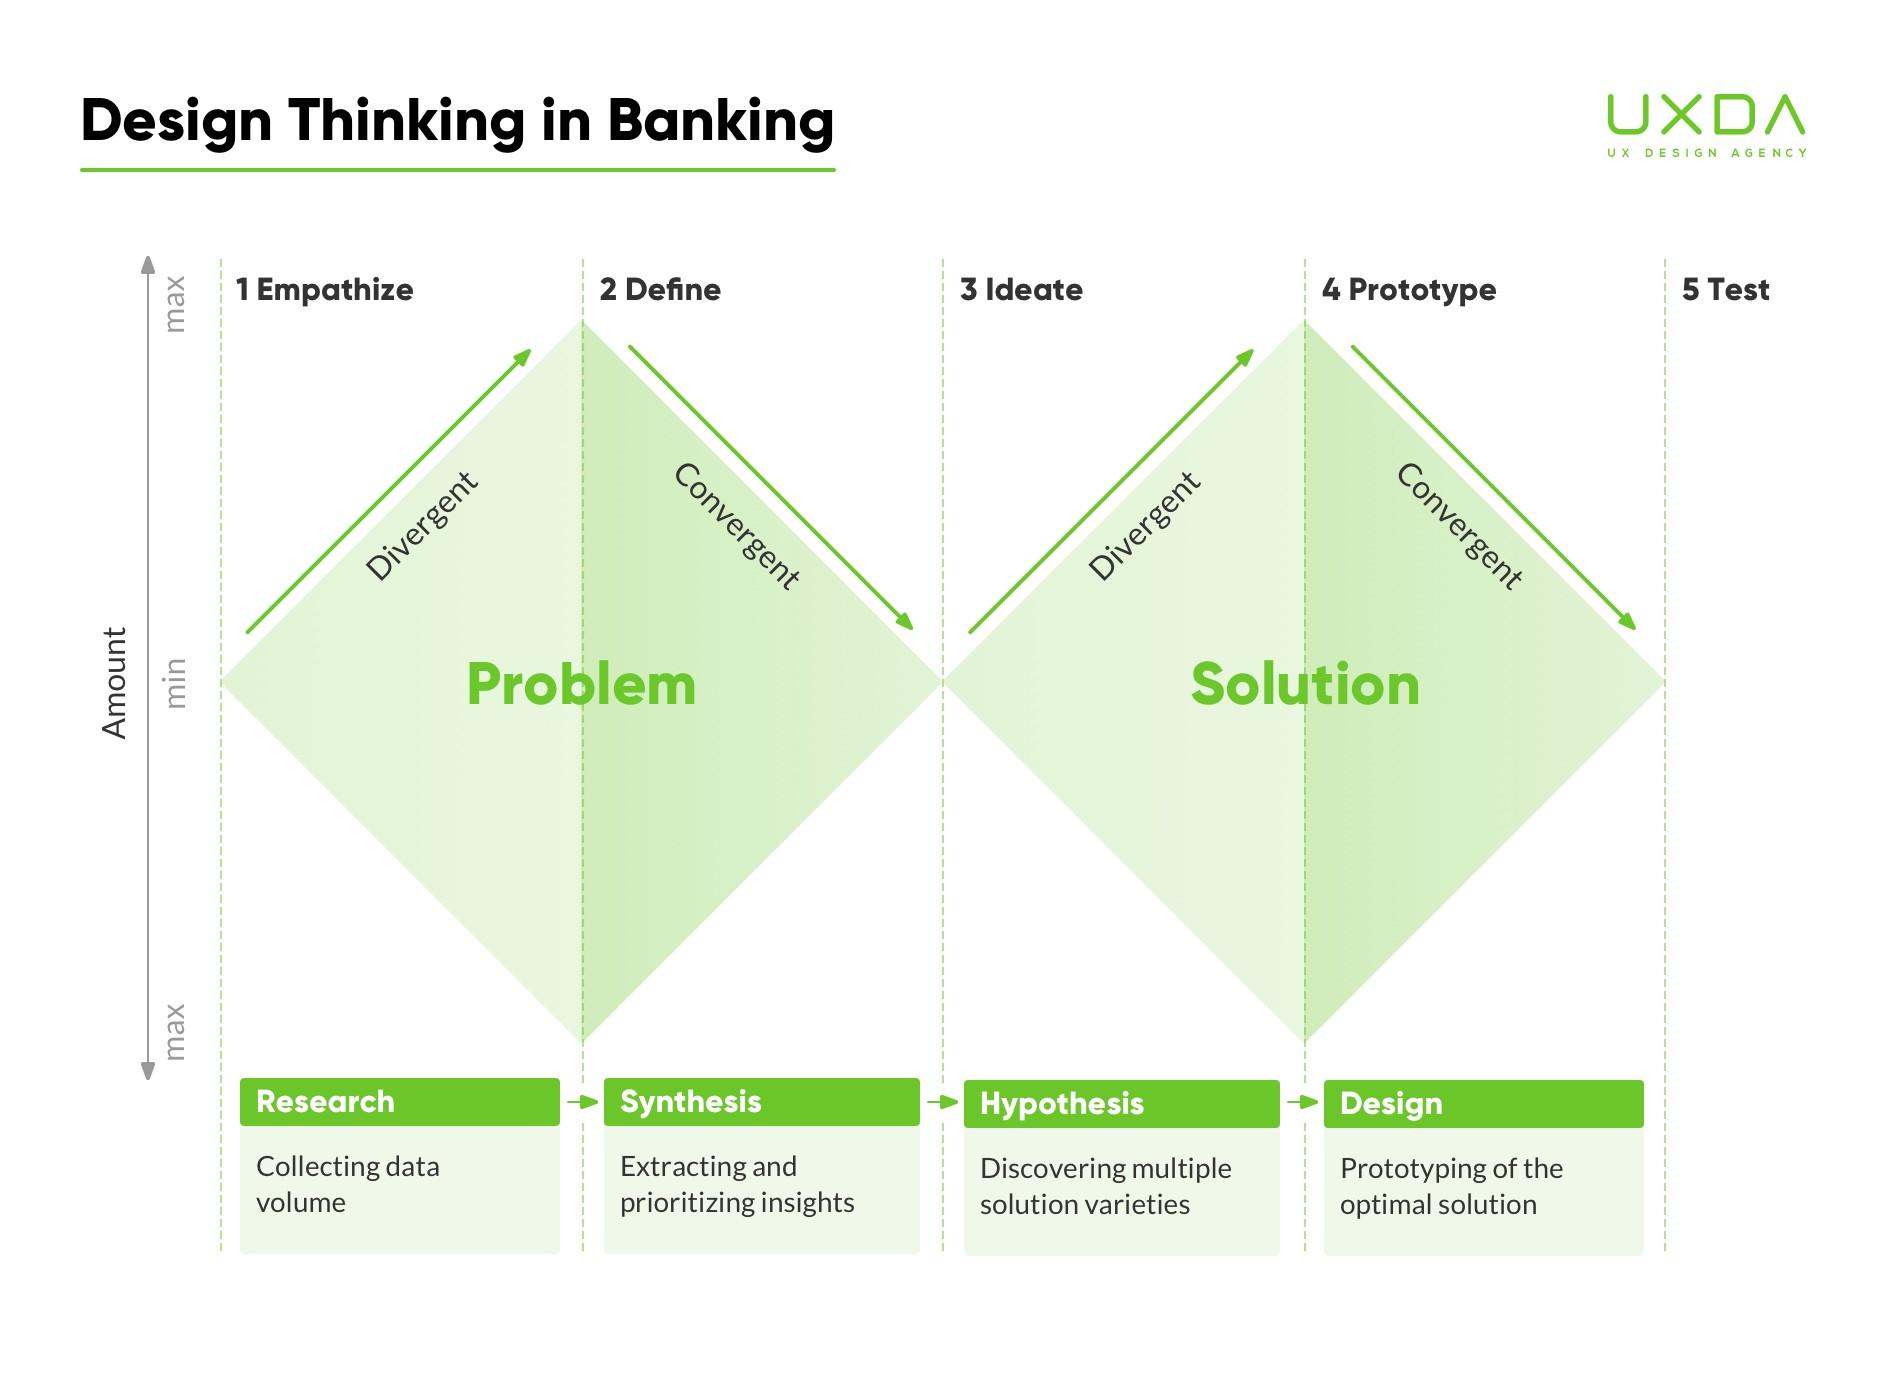 design-thinking-in-banking-double-diamond-2.jpg